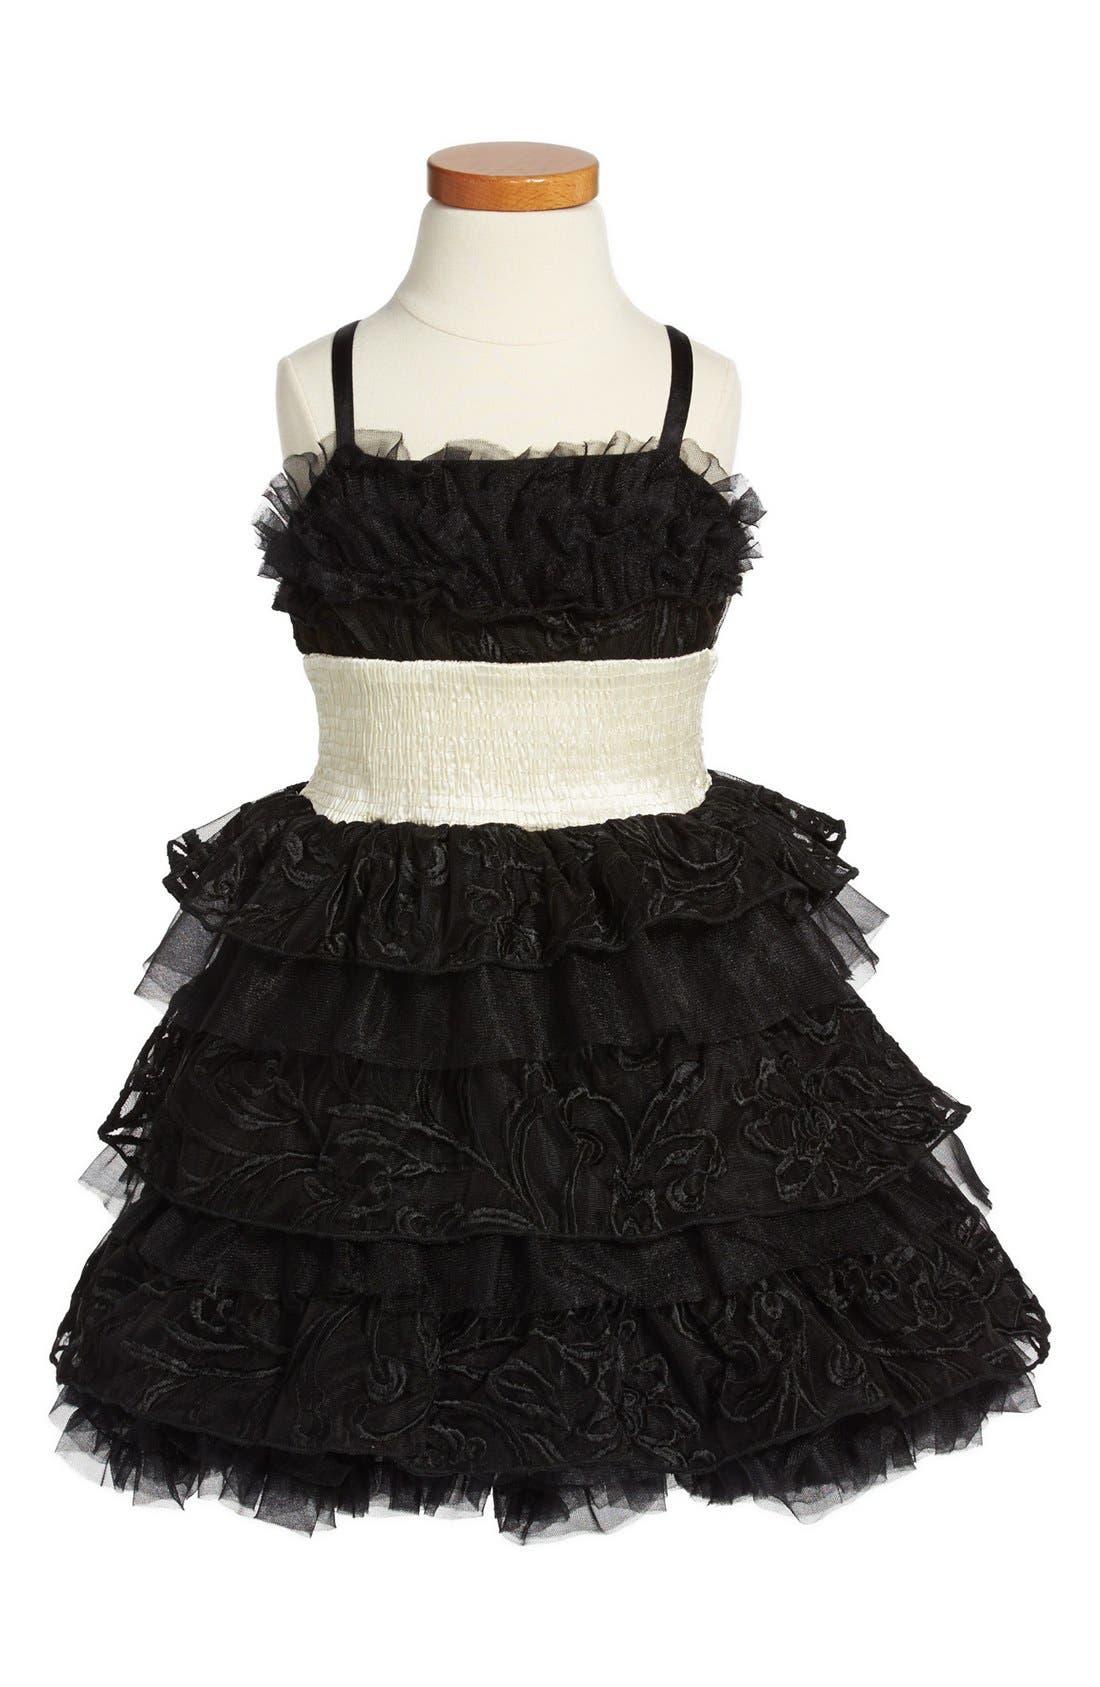 Main Image - Ooh! La, La! Couture 'Wow - Cake' Dress (Little Girls & Big Girls)